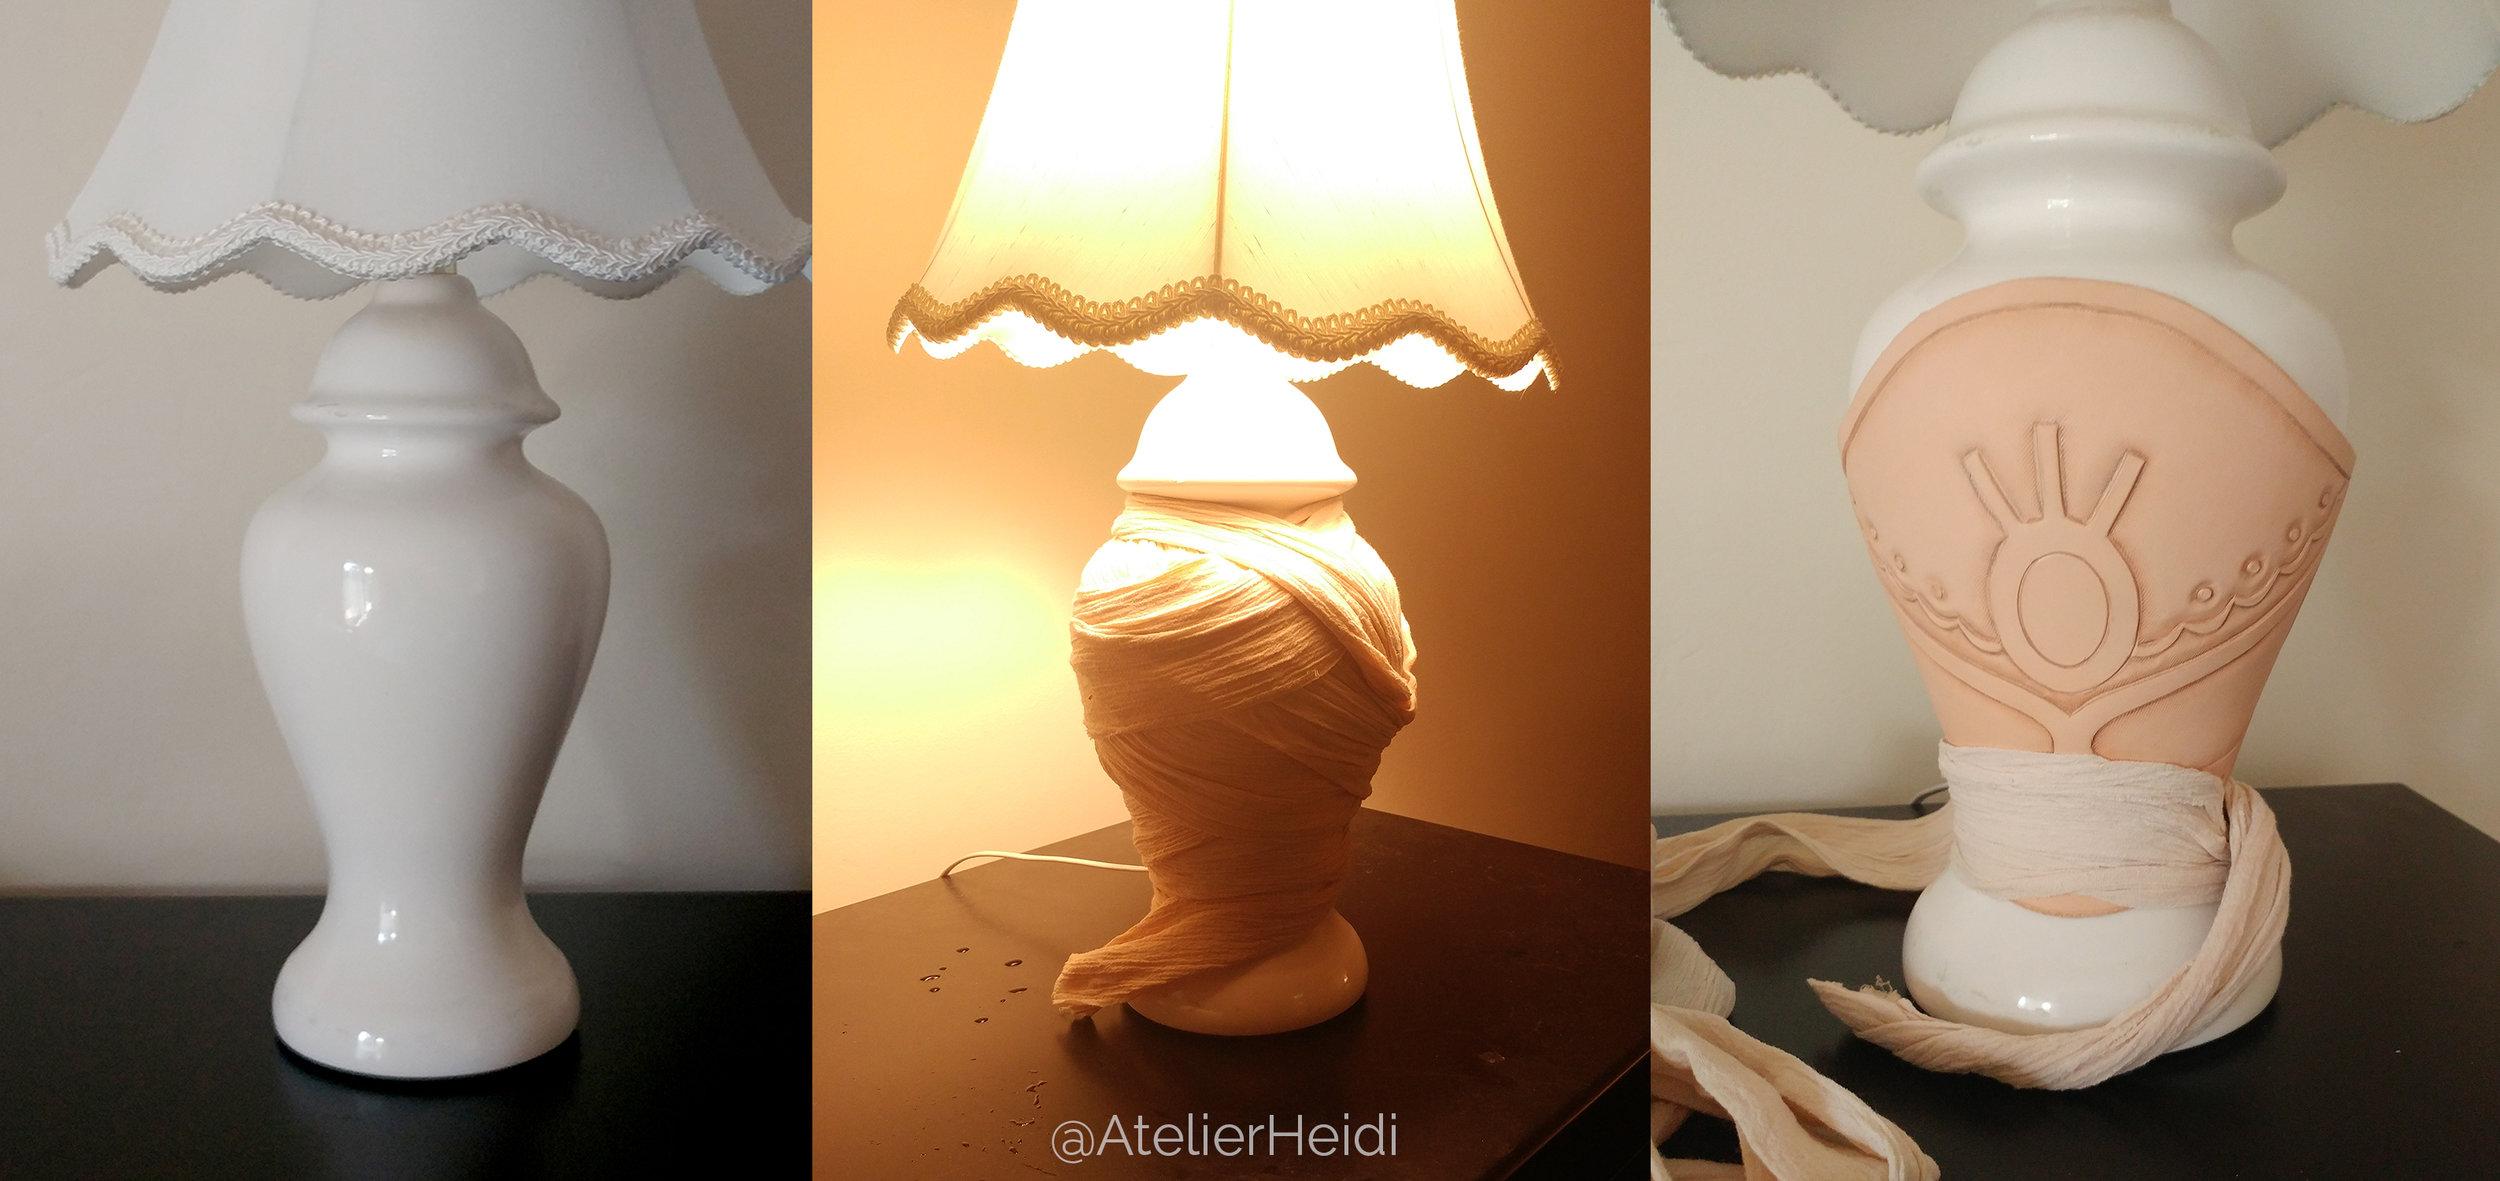 lamp collage.jpg